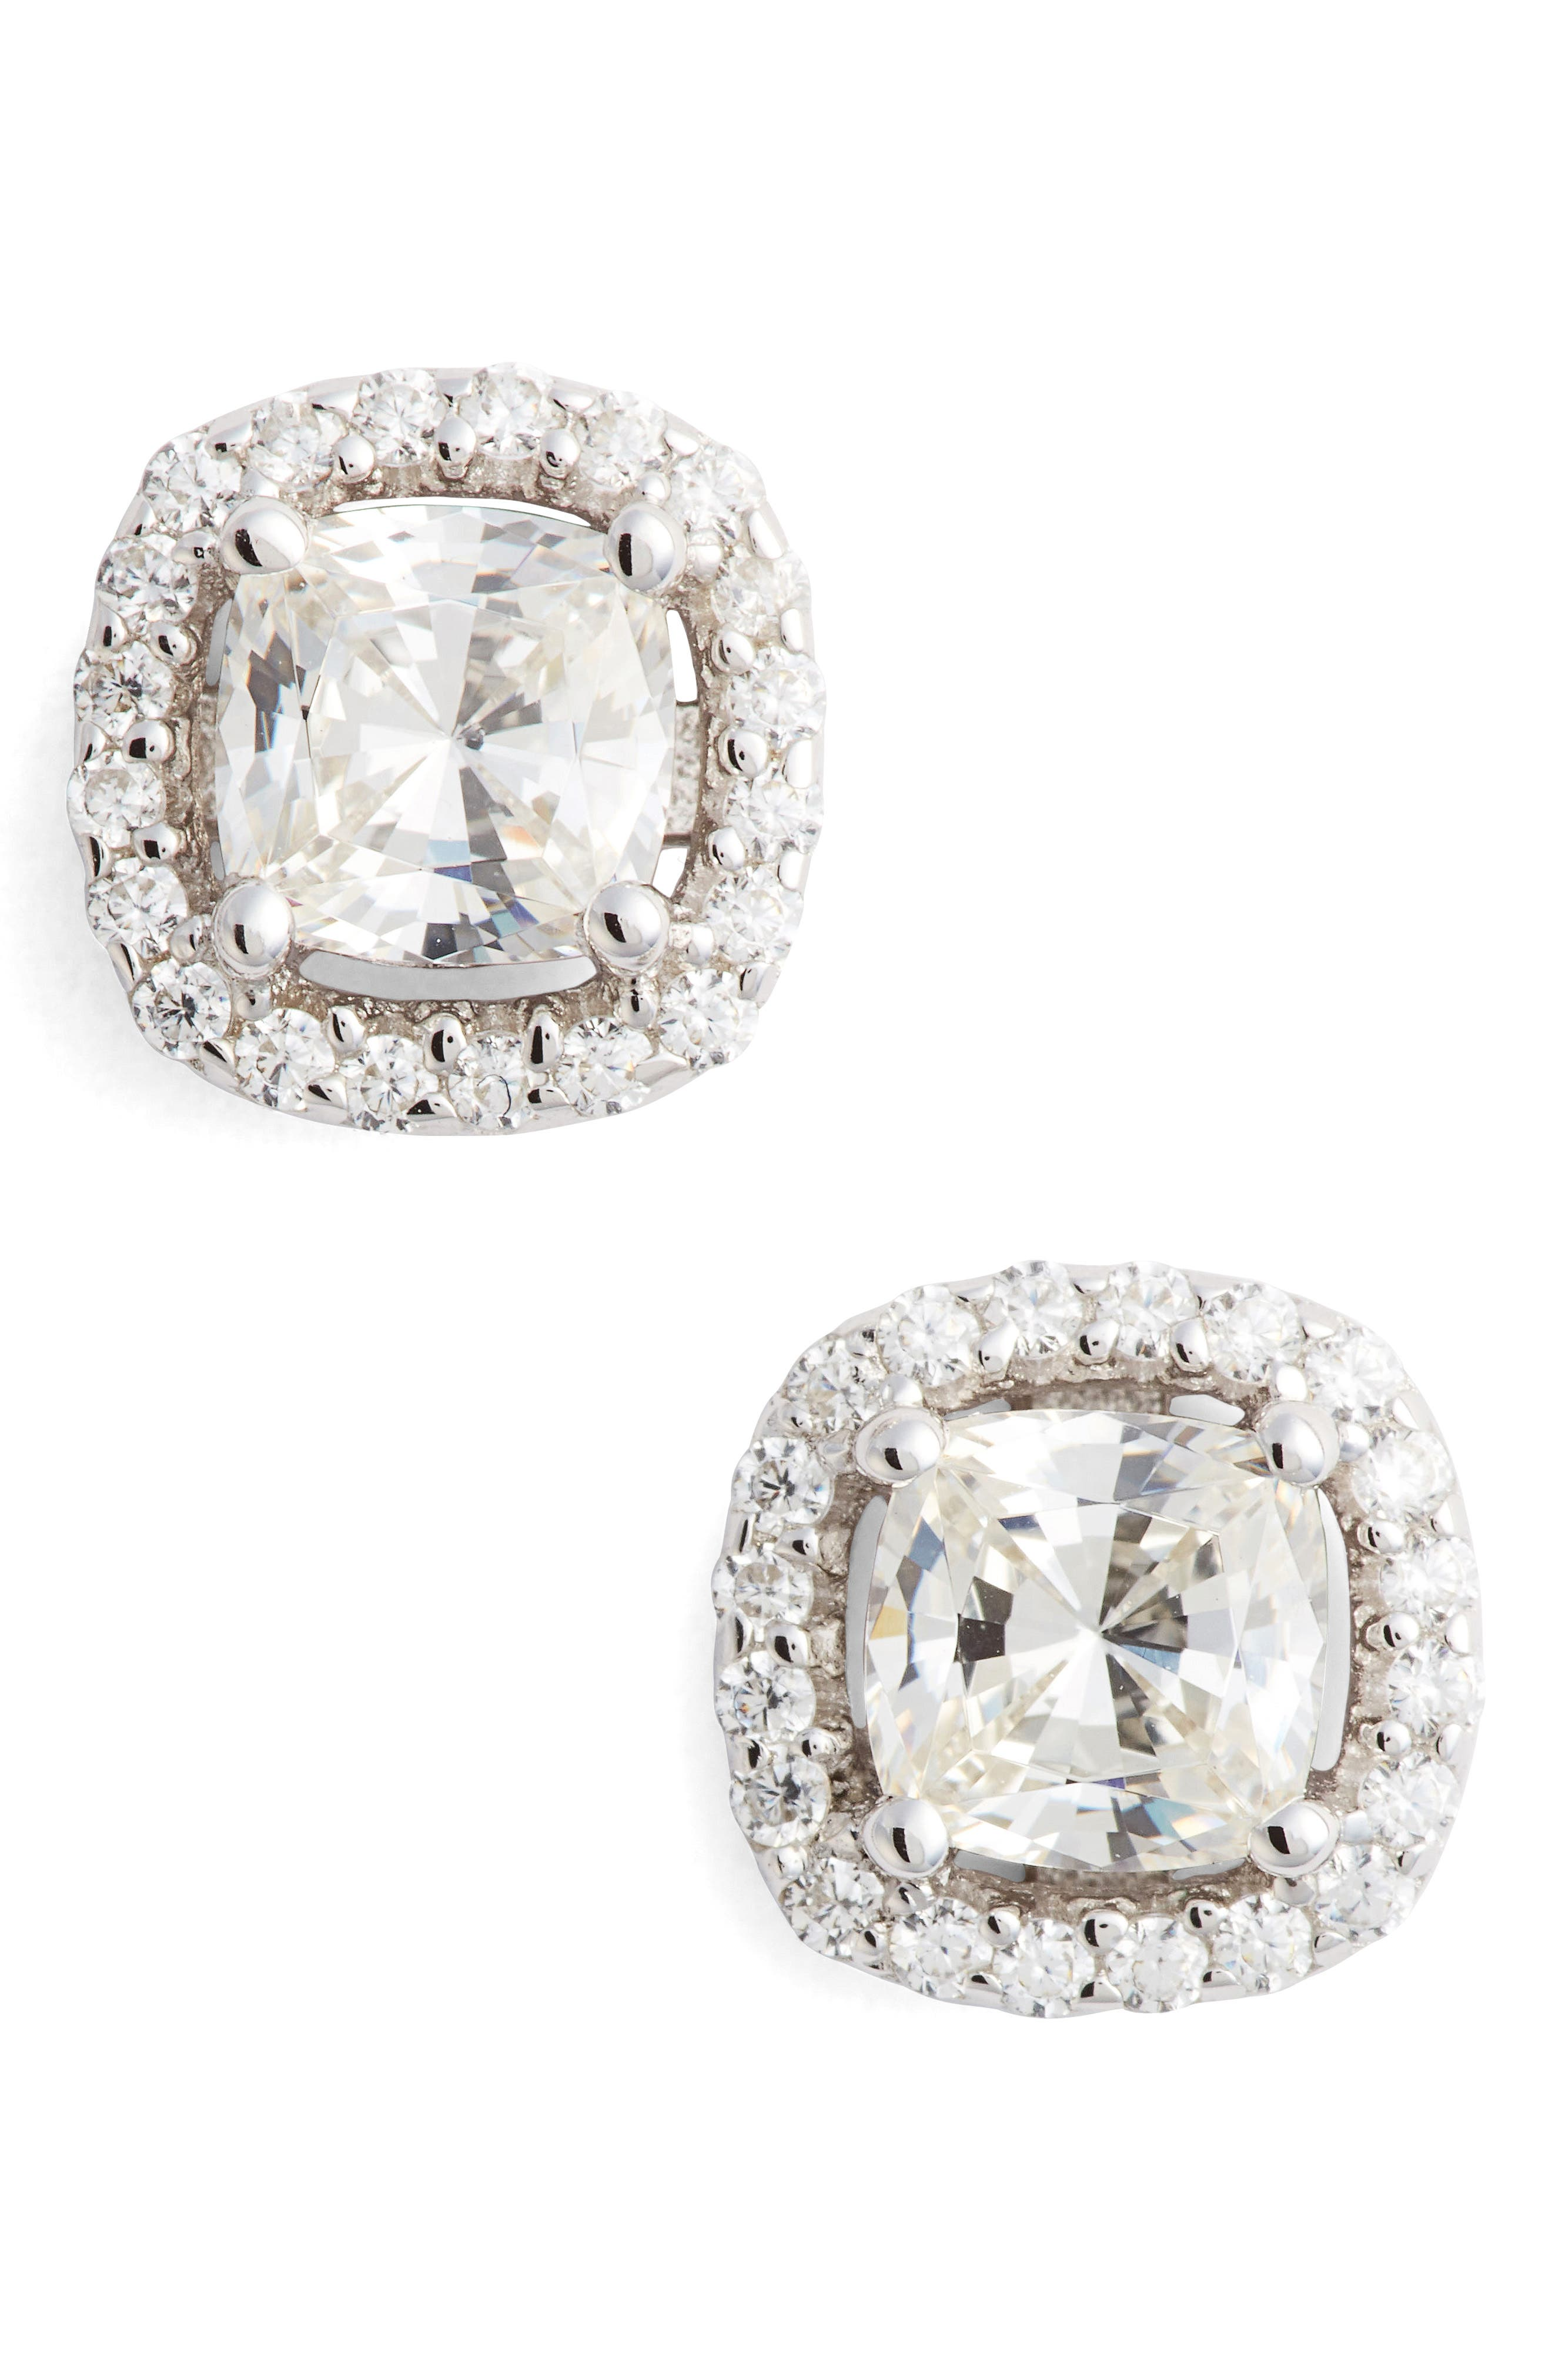 Cushion Cut Simulated Diamond Stud Earrings,                         Main,                         color, Silver/ Clear